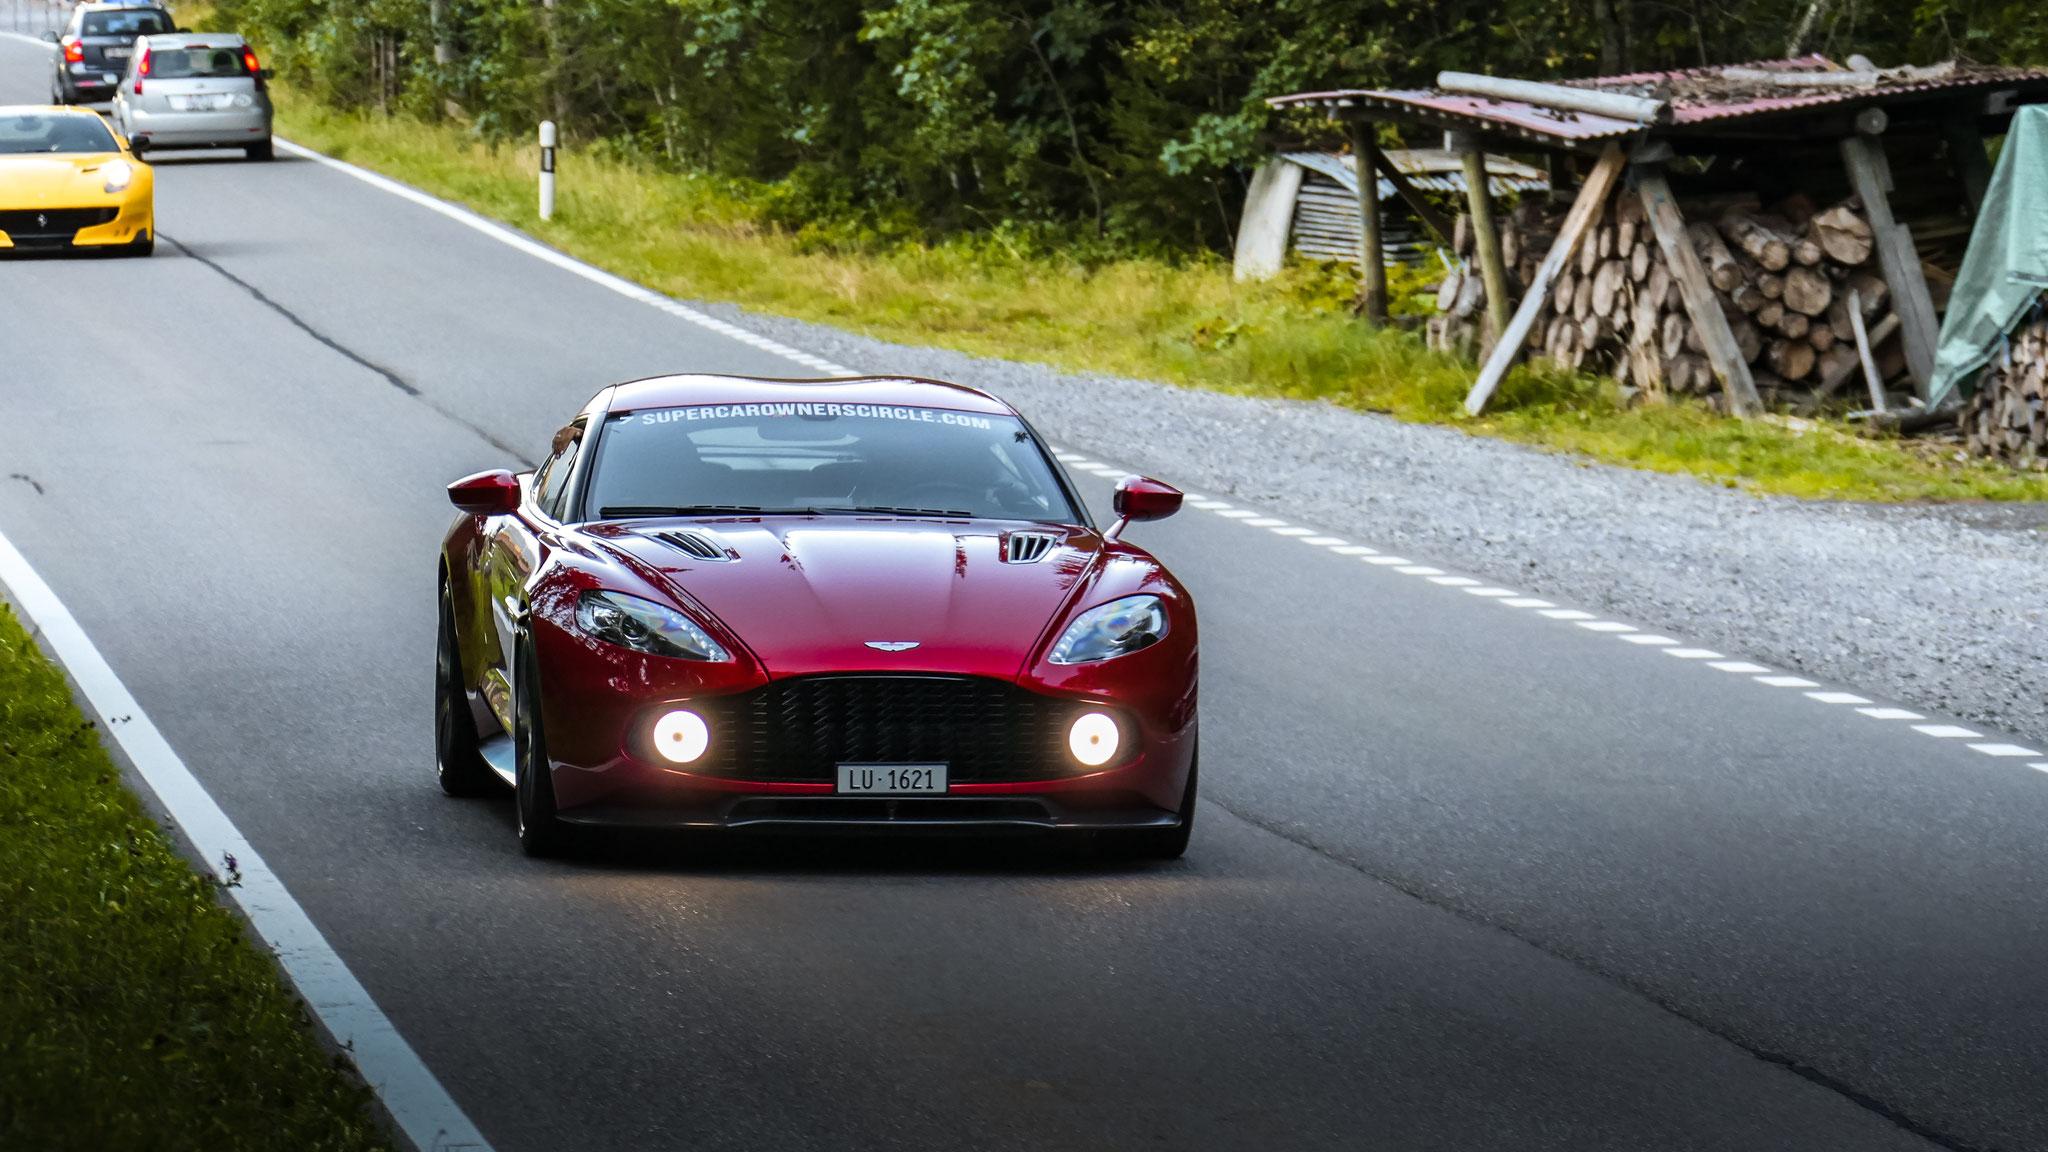 Aston Martin Vanquish Zagato - LU-1621 (CH)